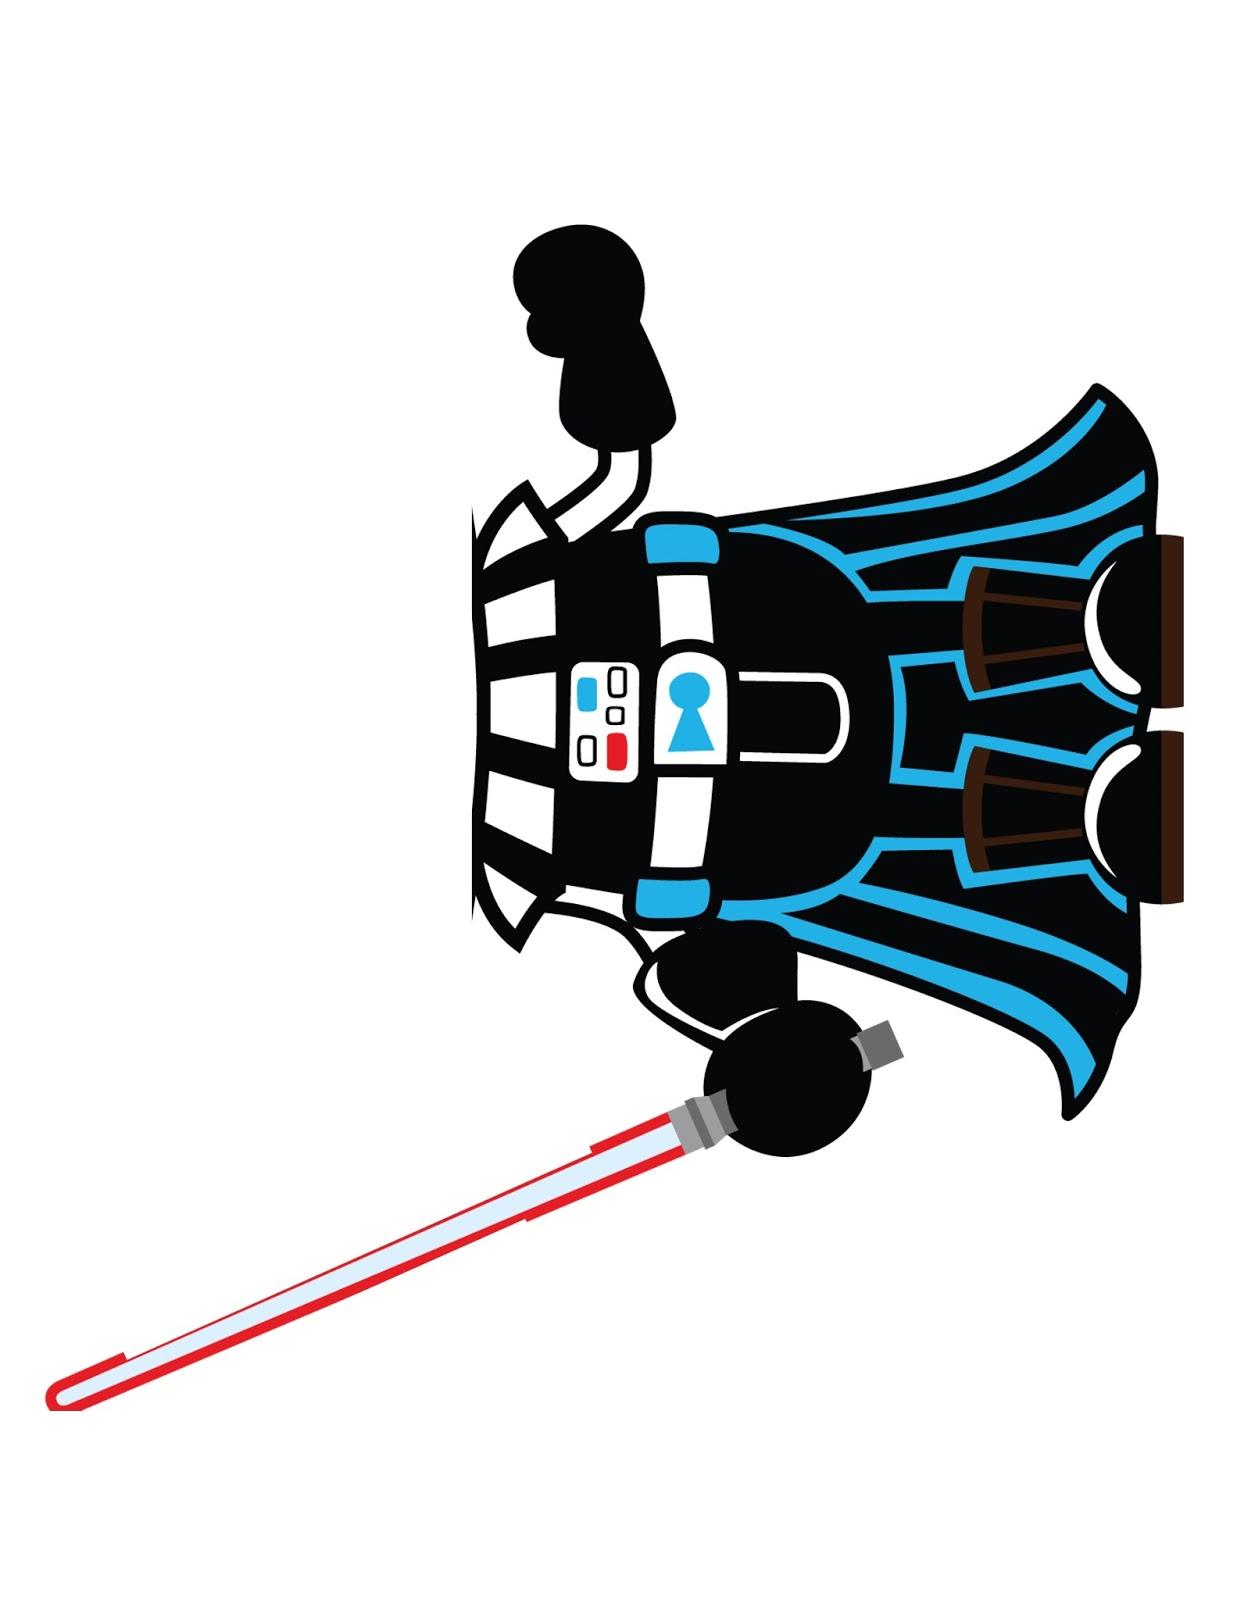 Famille lego star wars deguisement tete vador stormtrooper r2d2 yoda maul bricolage - Deguisement tete de lego ...